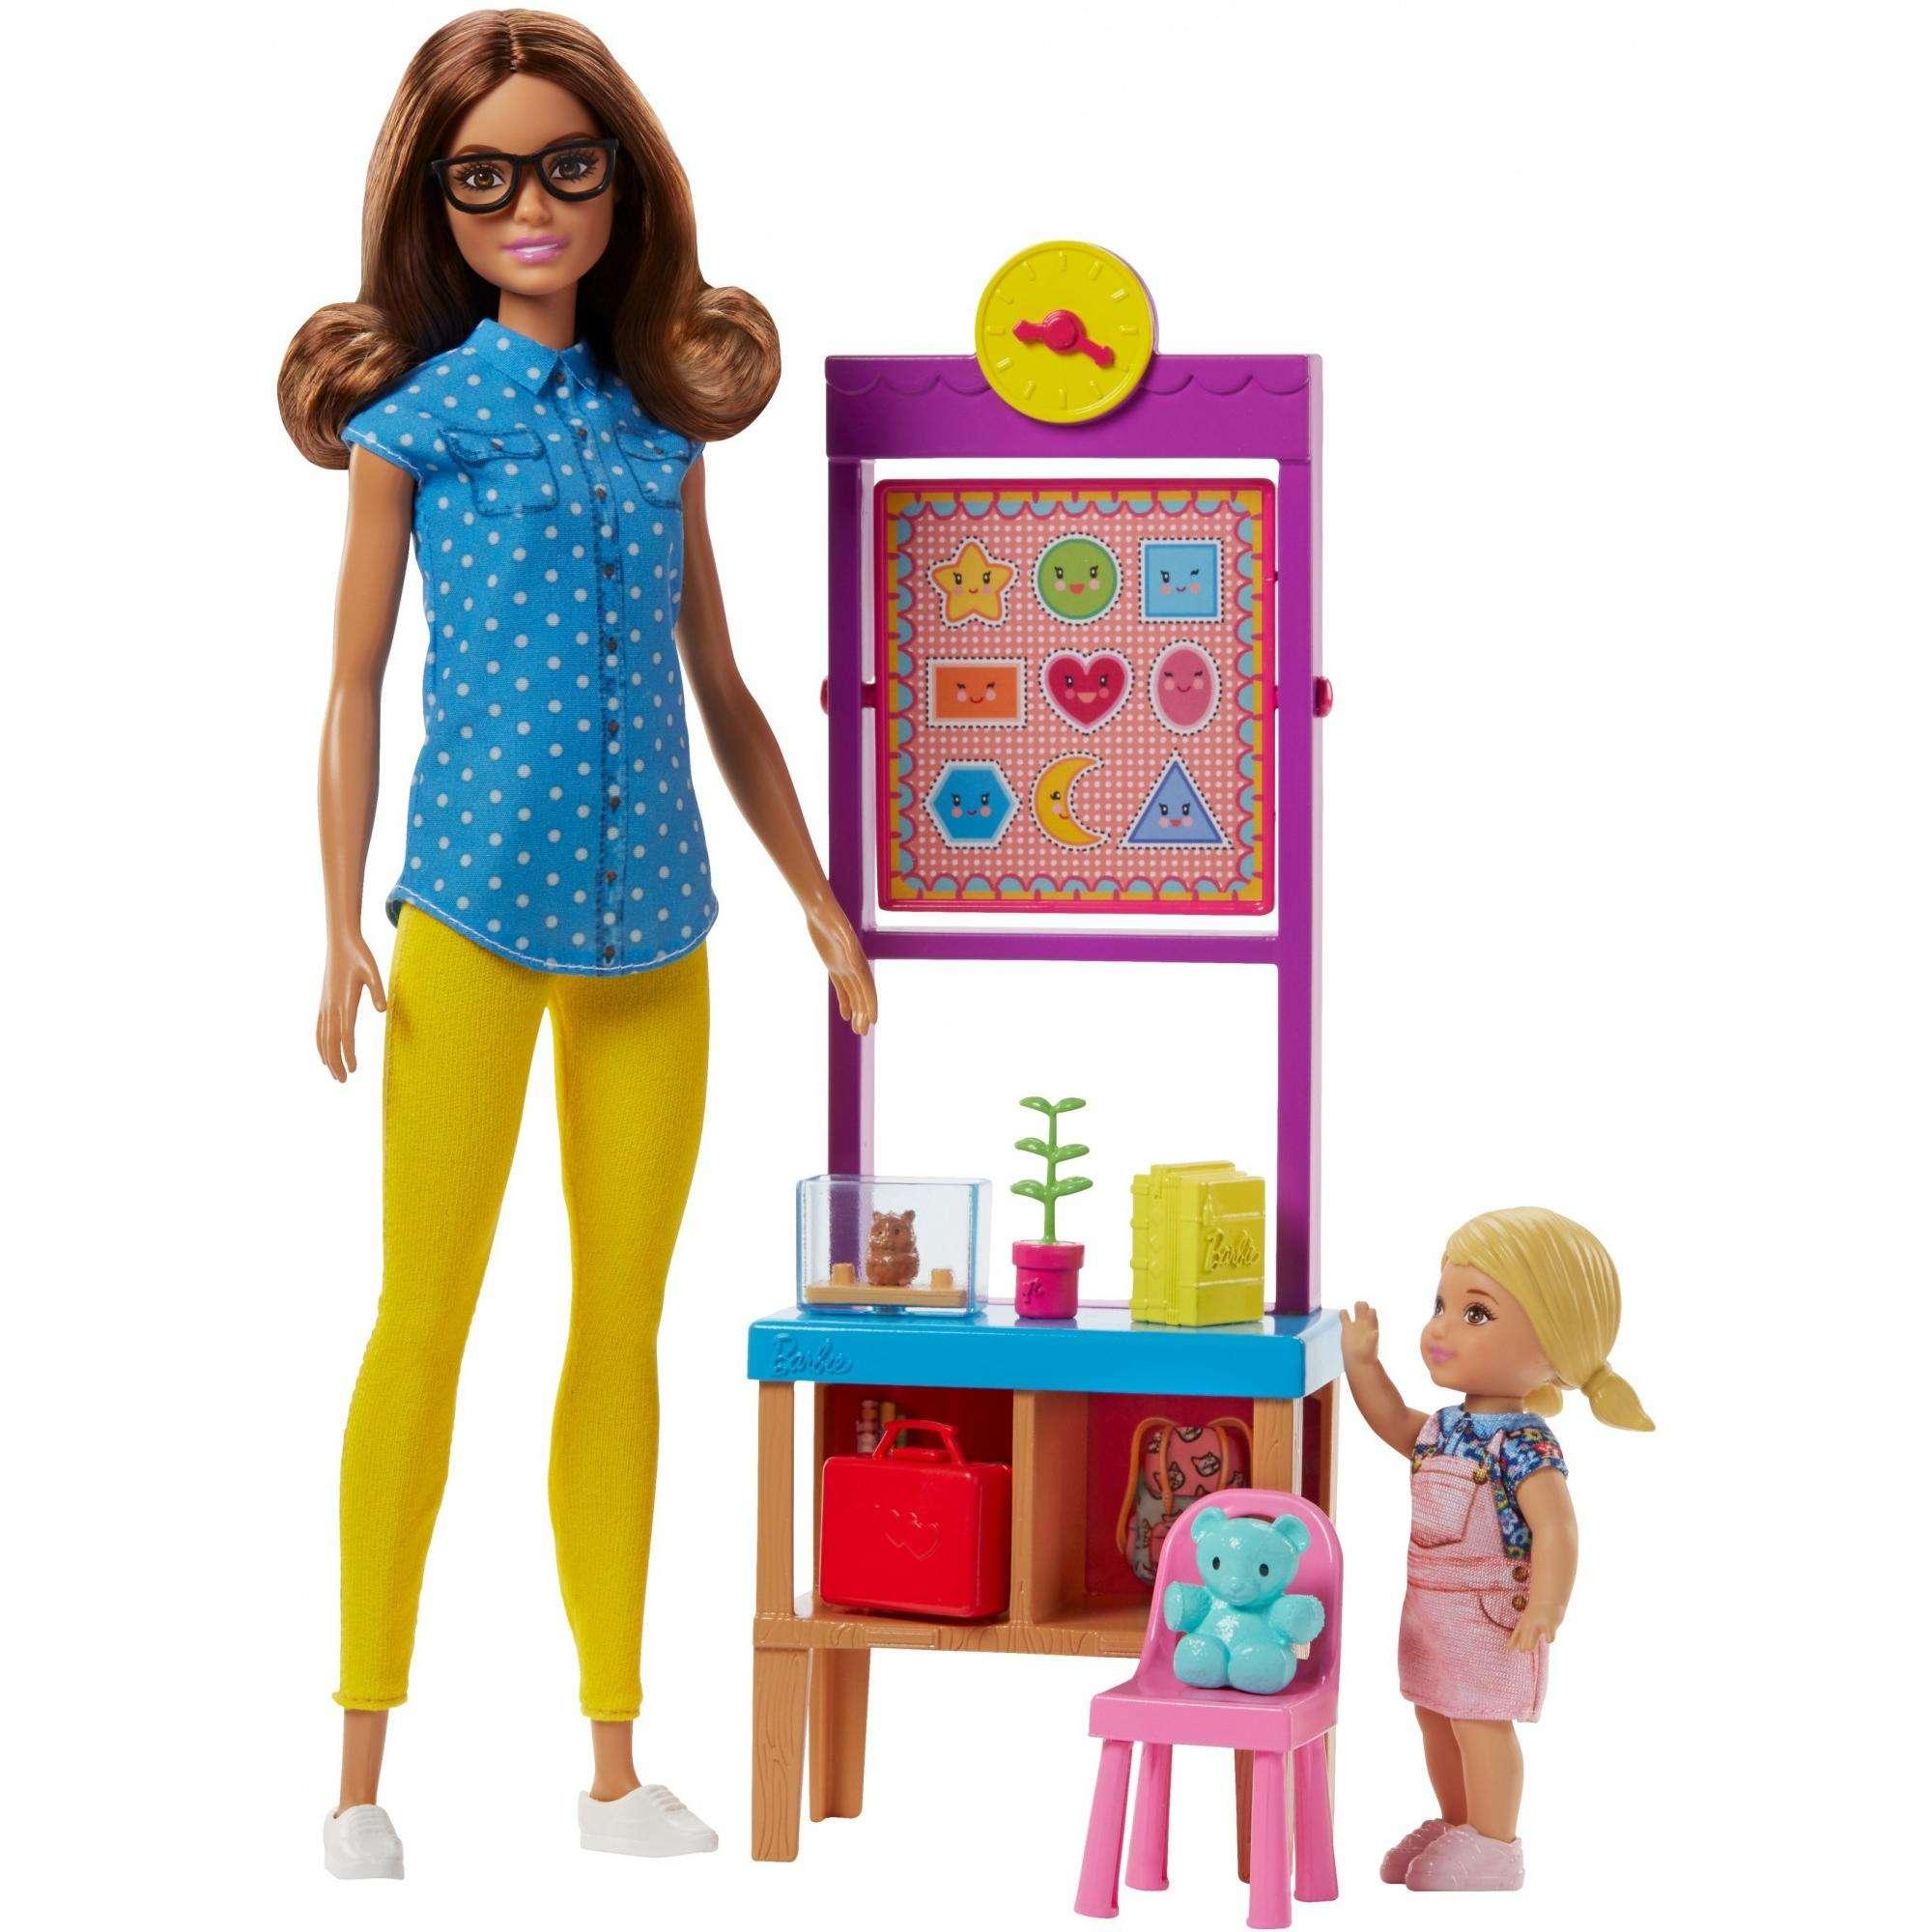 Barbie Career Teacher Playset with Teacher, Student & Accessories